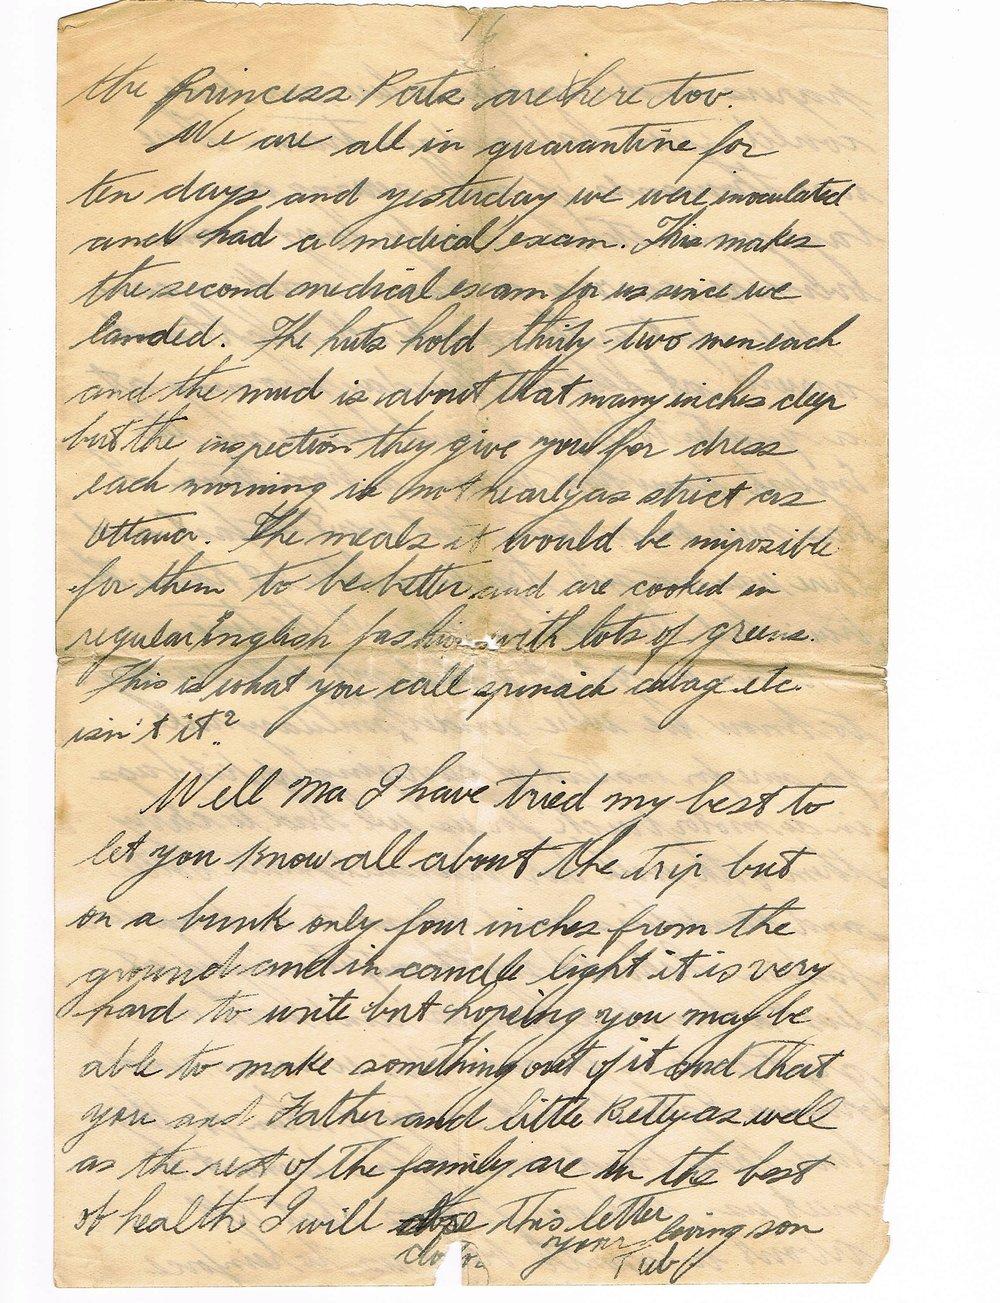 Basil Vale January 2, 1918 letter - page 16.jpg